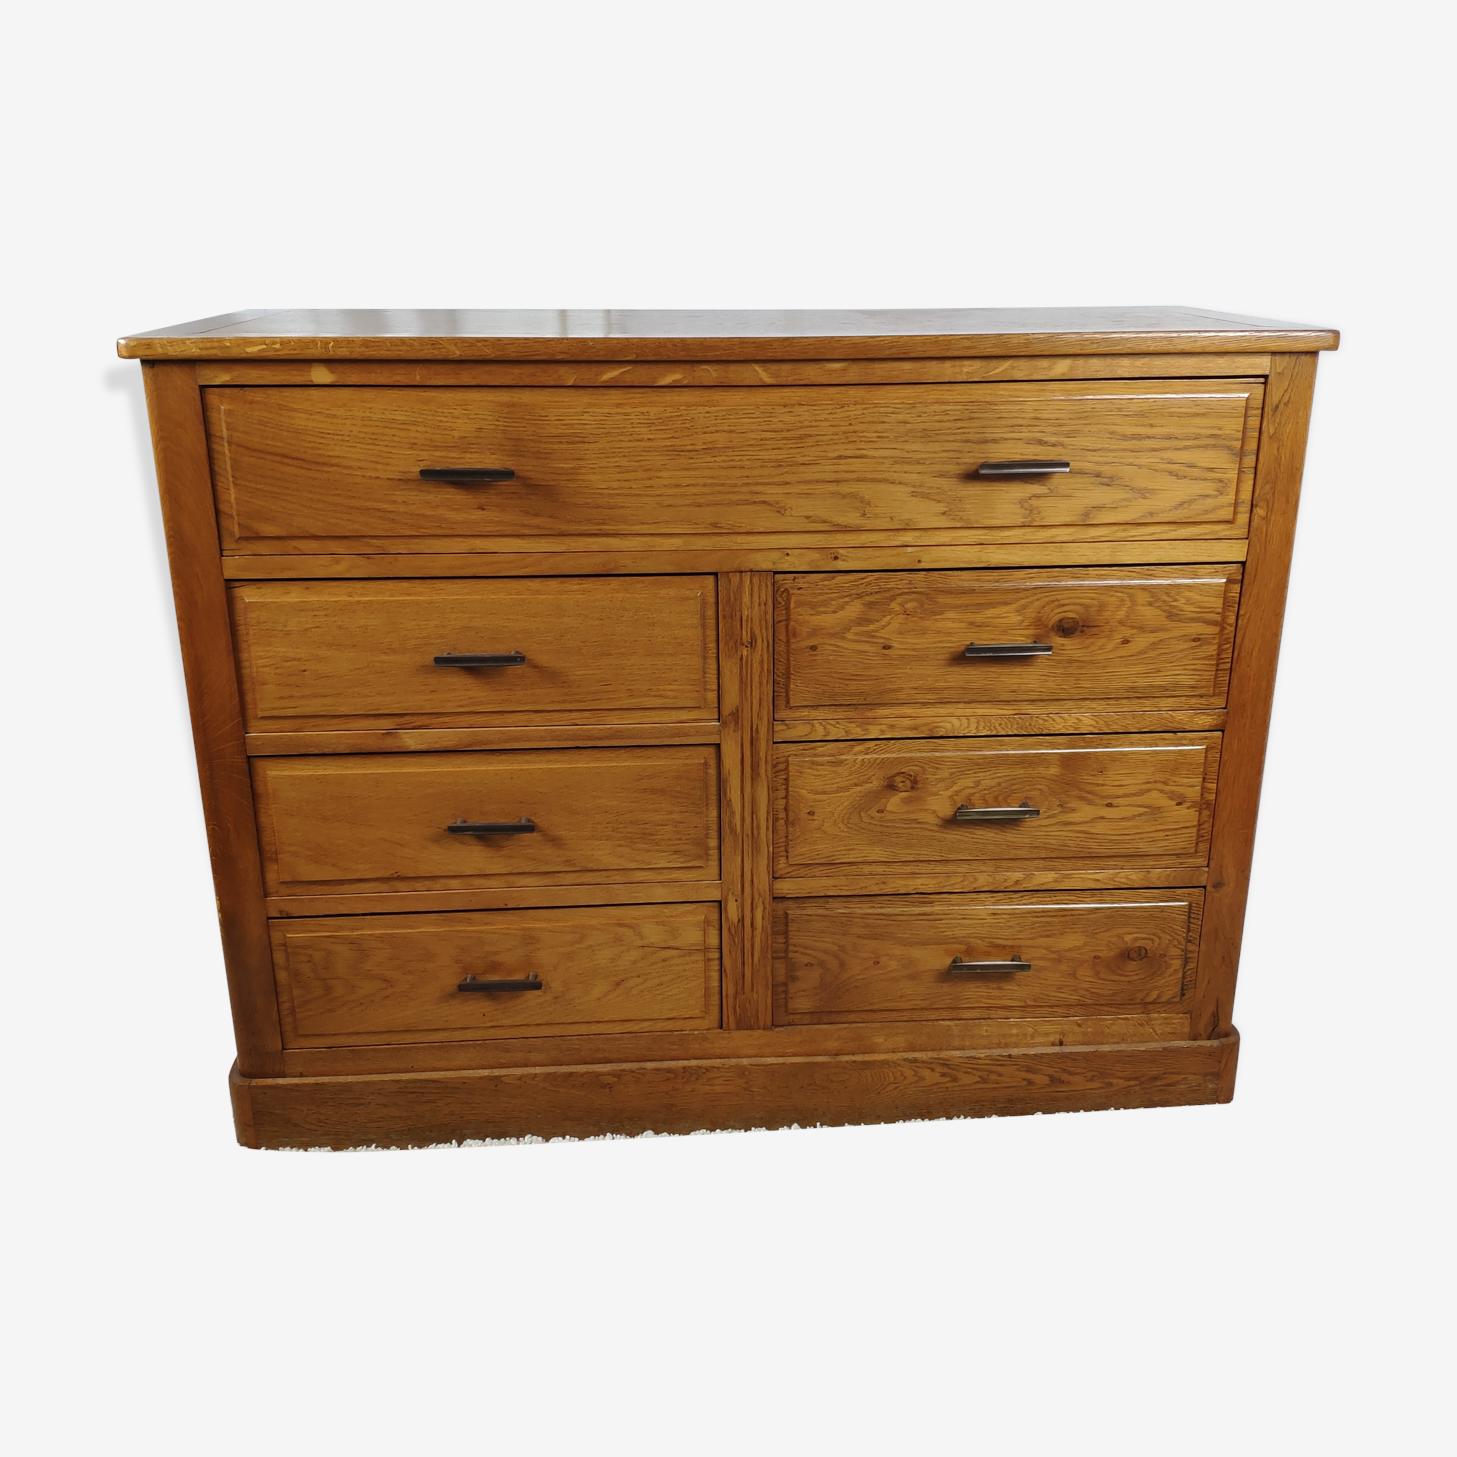 70's dresser